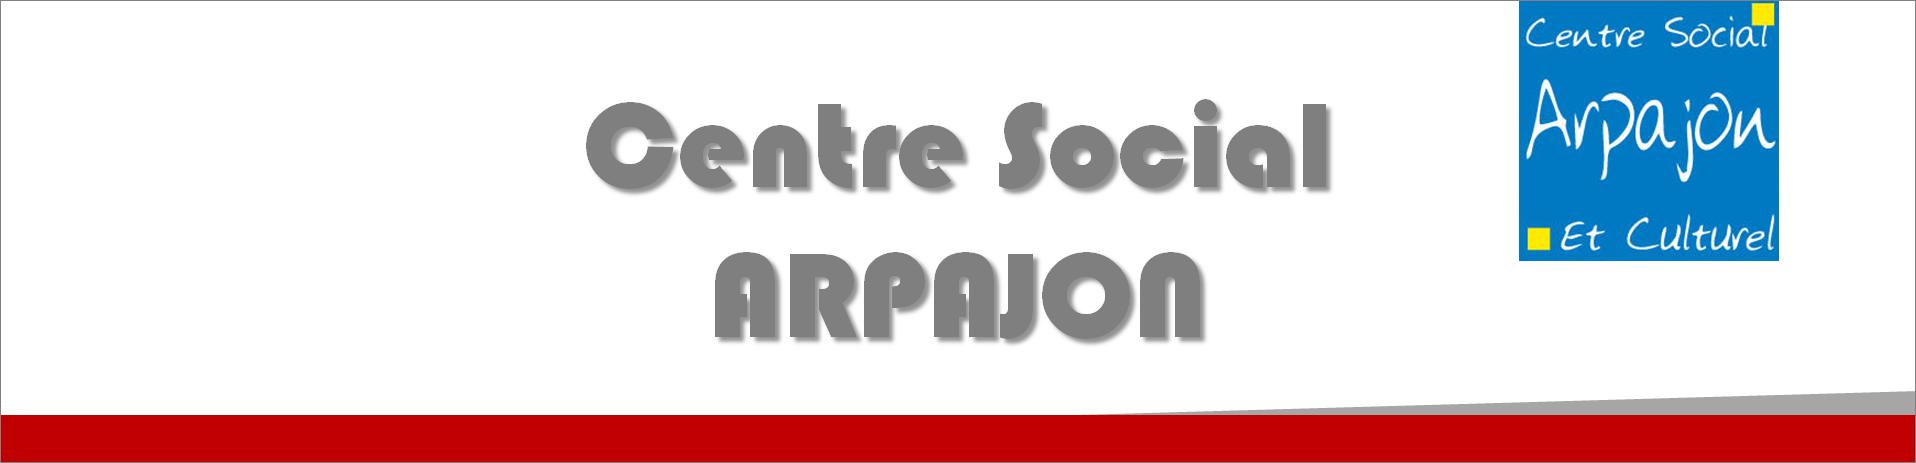 bANIERE CENTRE SOCIALE